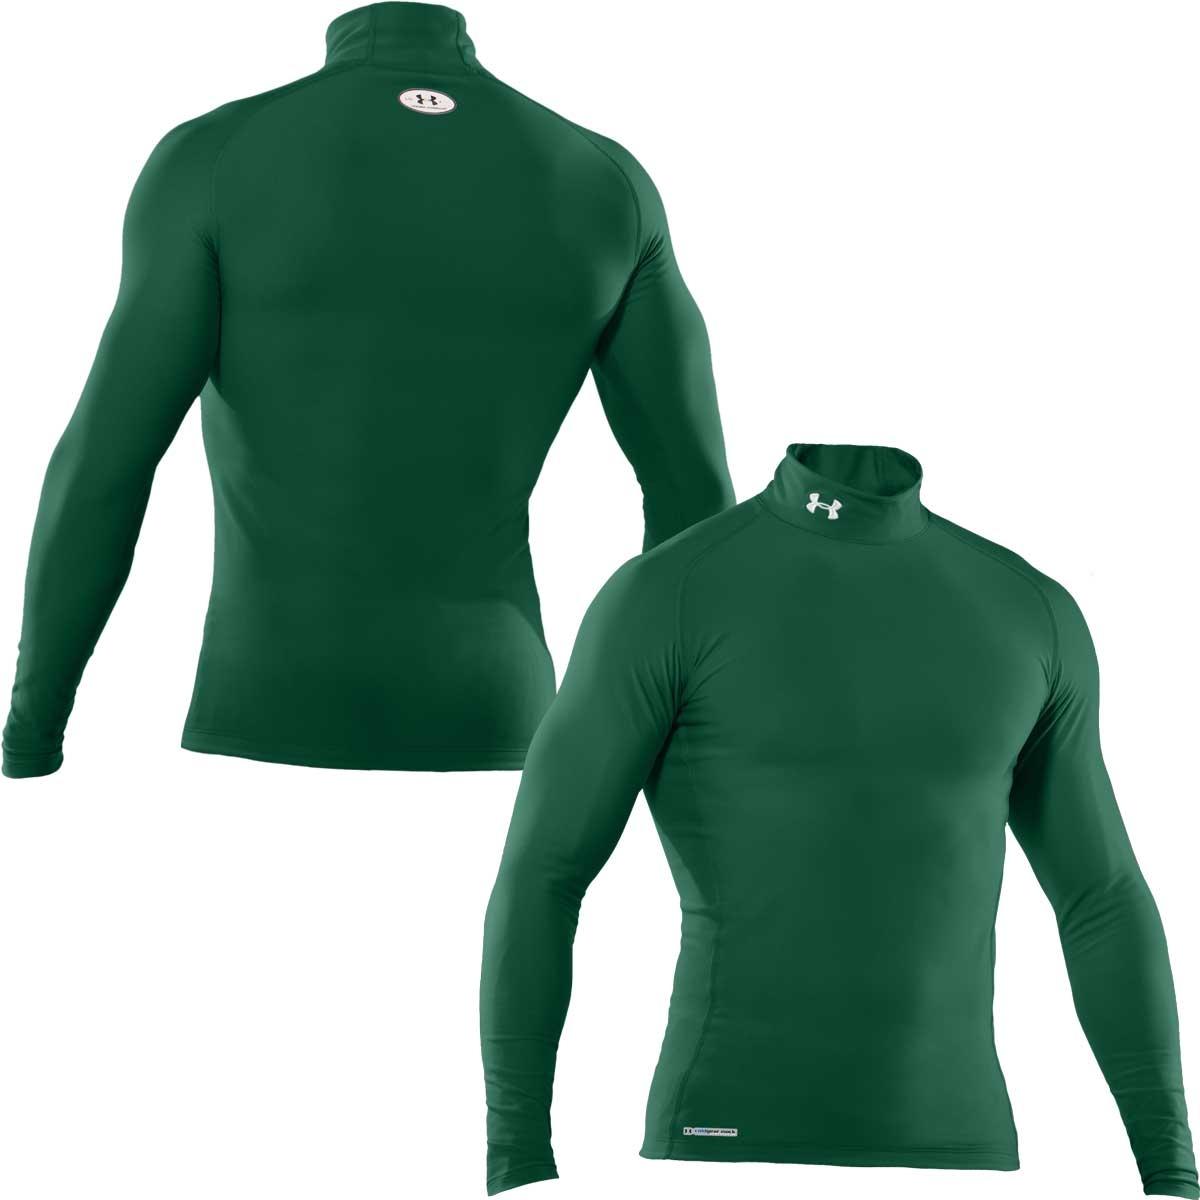 d80ef7d21 Cheap under armour evo coldgear compression legging Buy Online ...